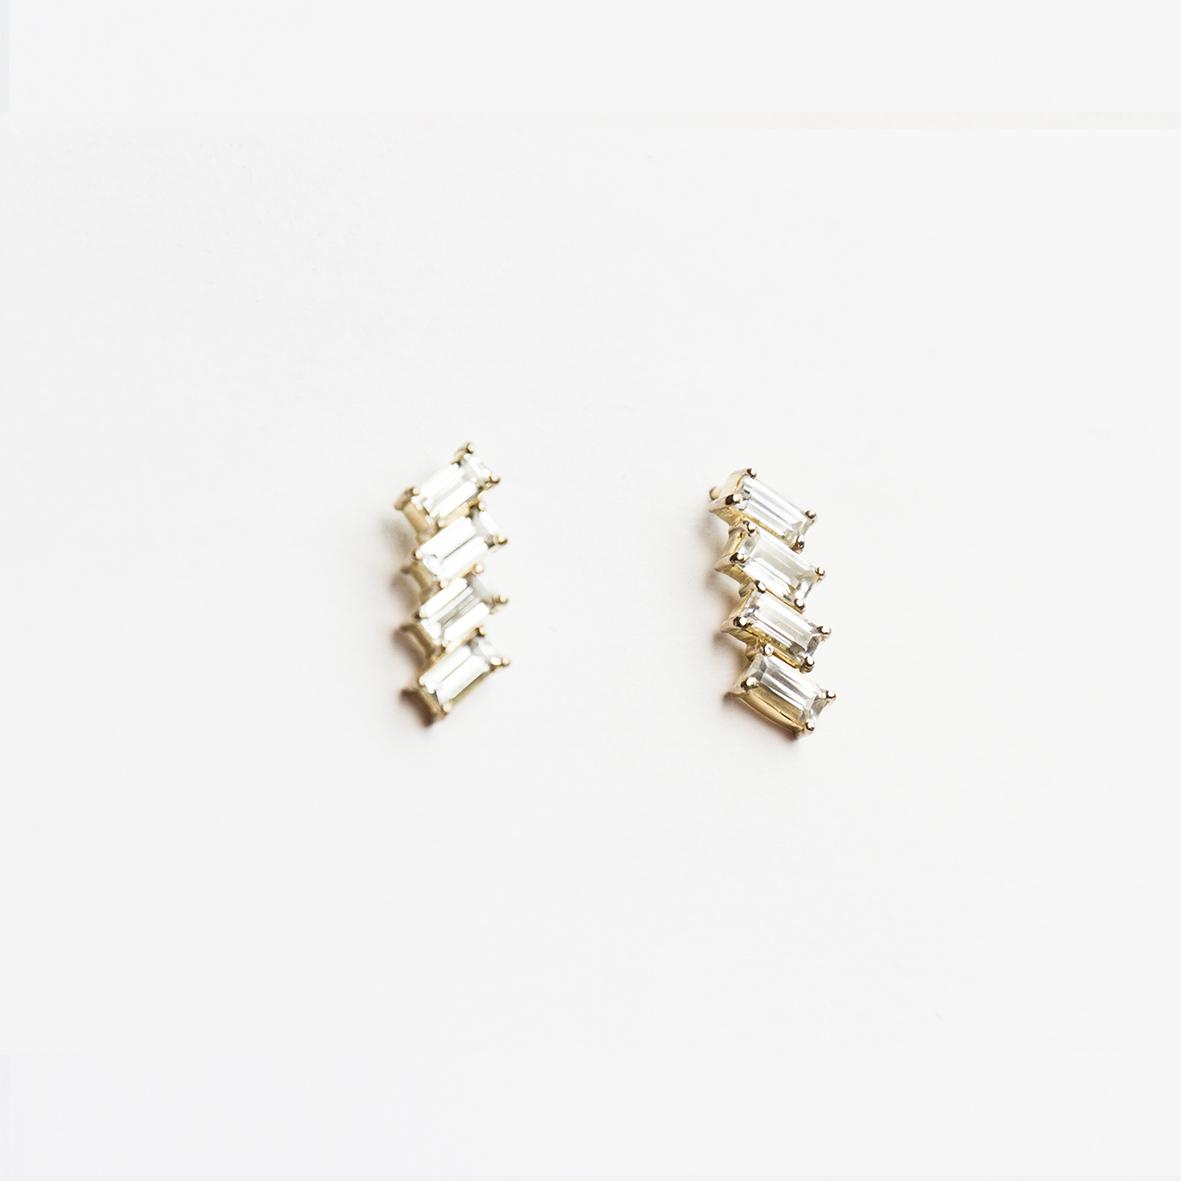 9. OONA_philo_ficha2_deco white sapphire earrings